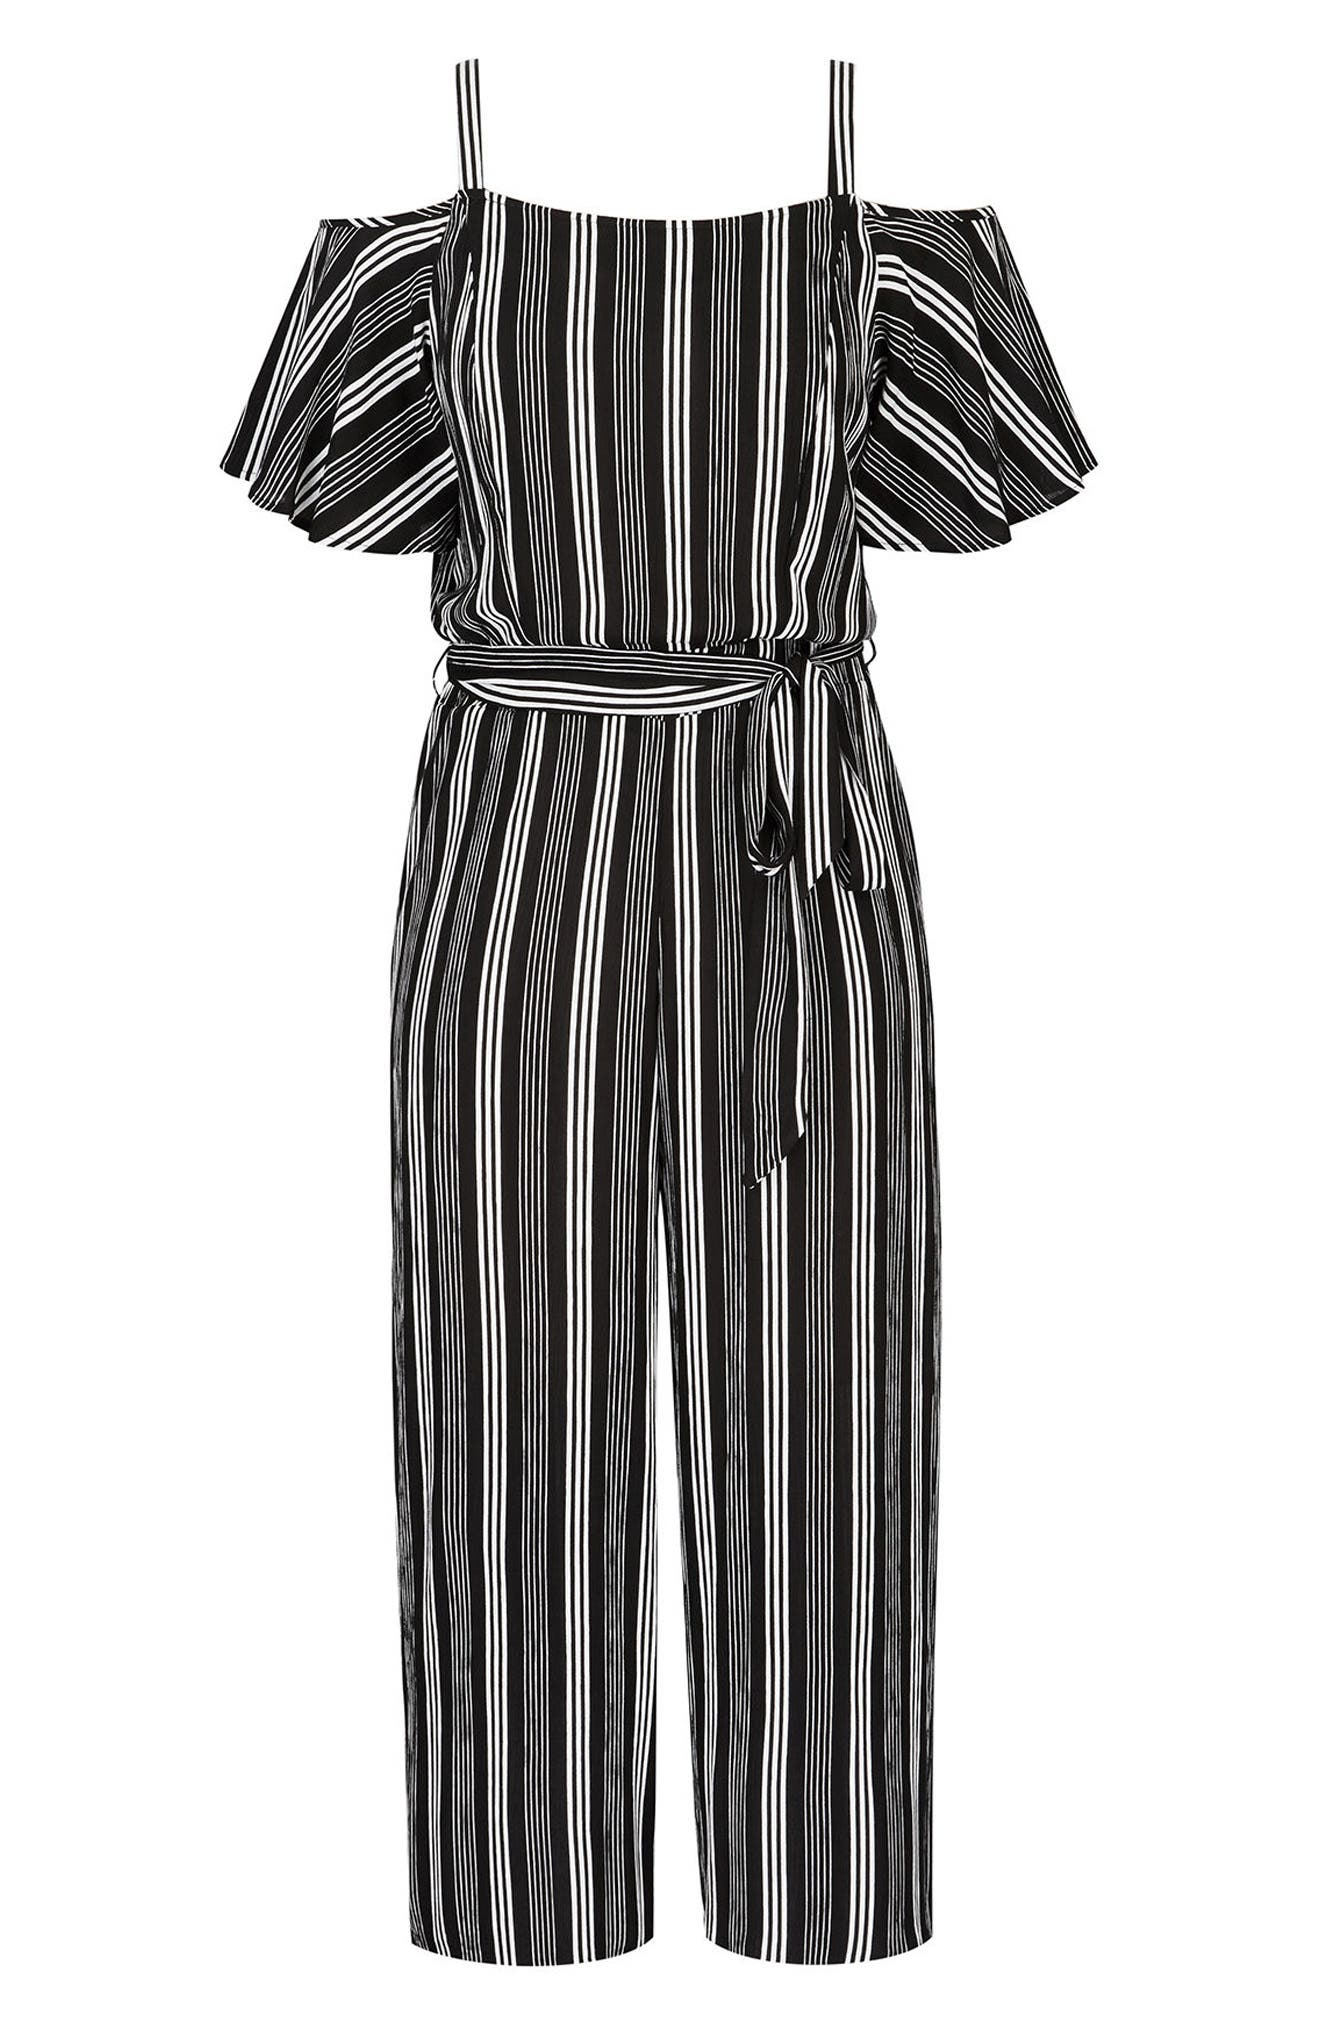 Stripe Play Cold Shoulder Jumpsuit,                             Alternate thumbnail 3, color,                             Stripe Play